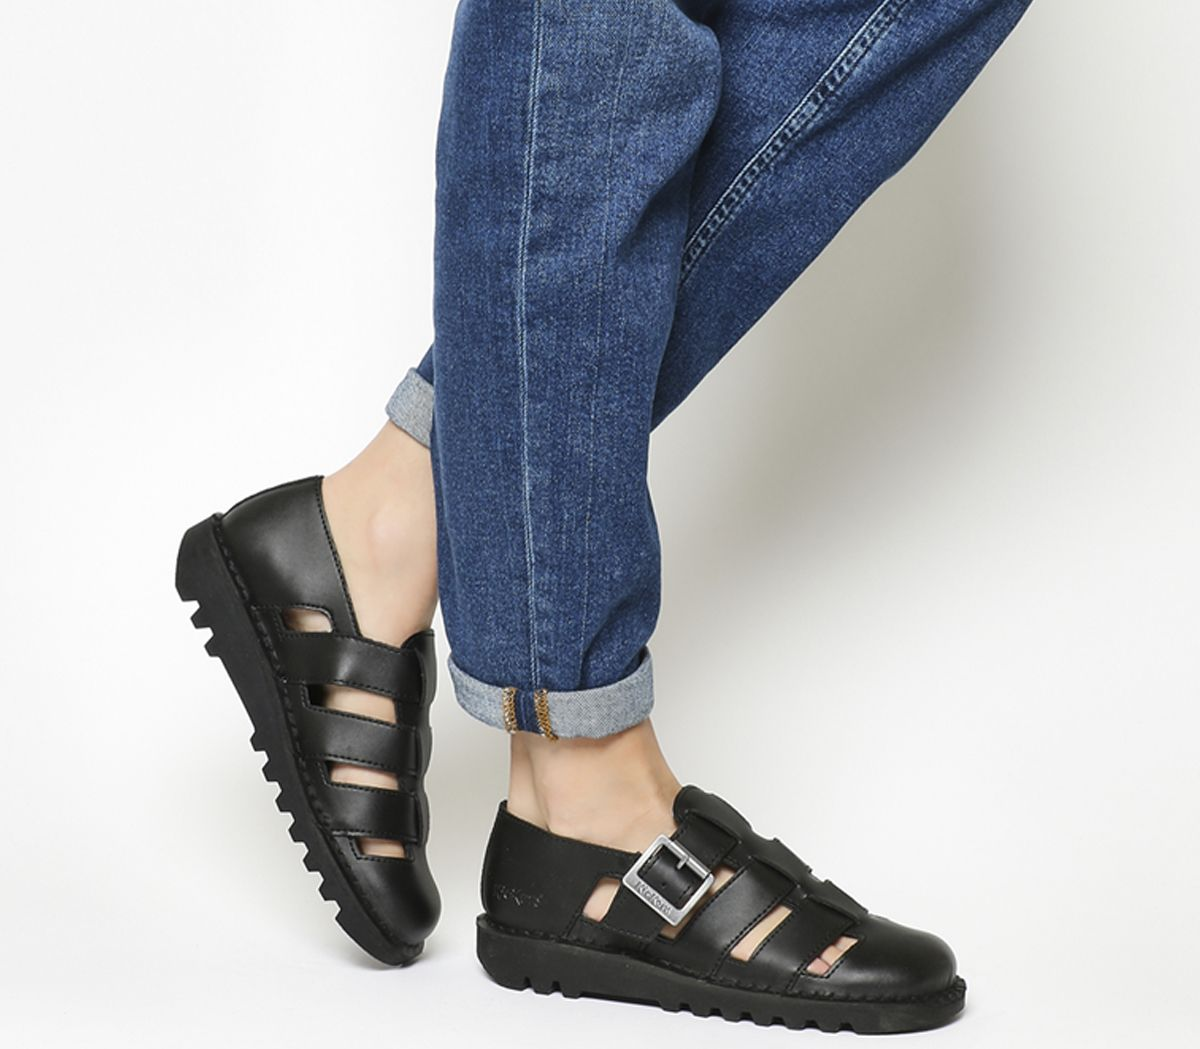 27da129daec Kickers Kick Low Weave Black Leather - Flats